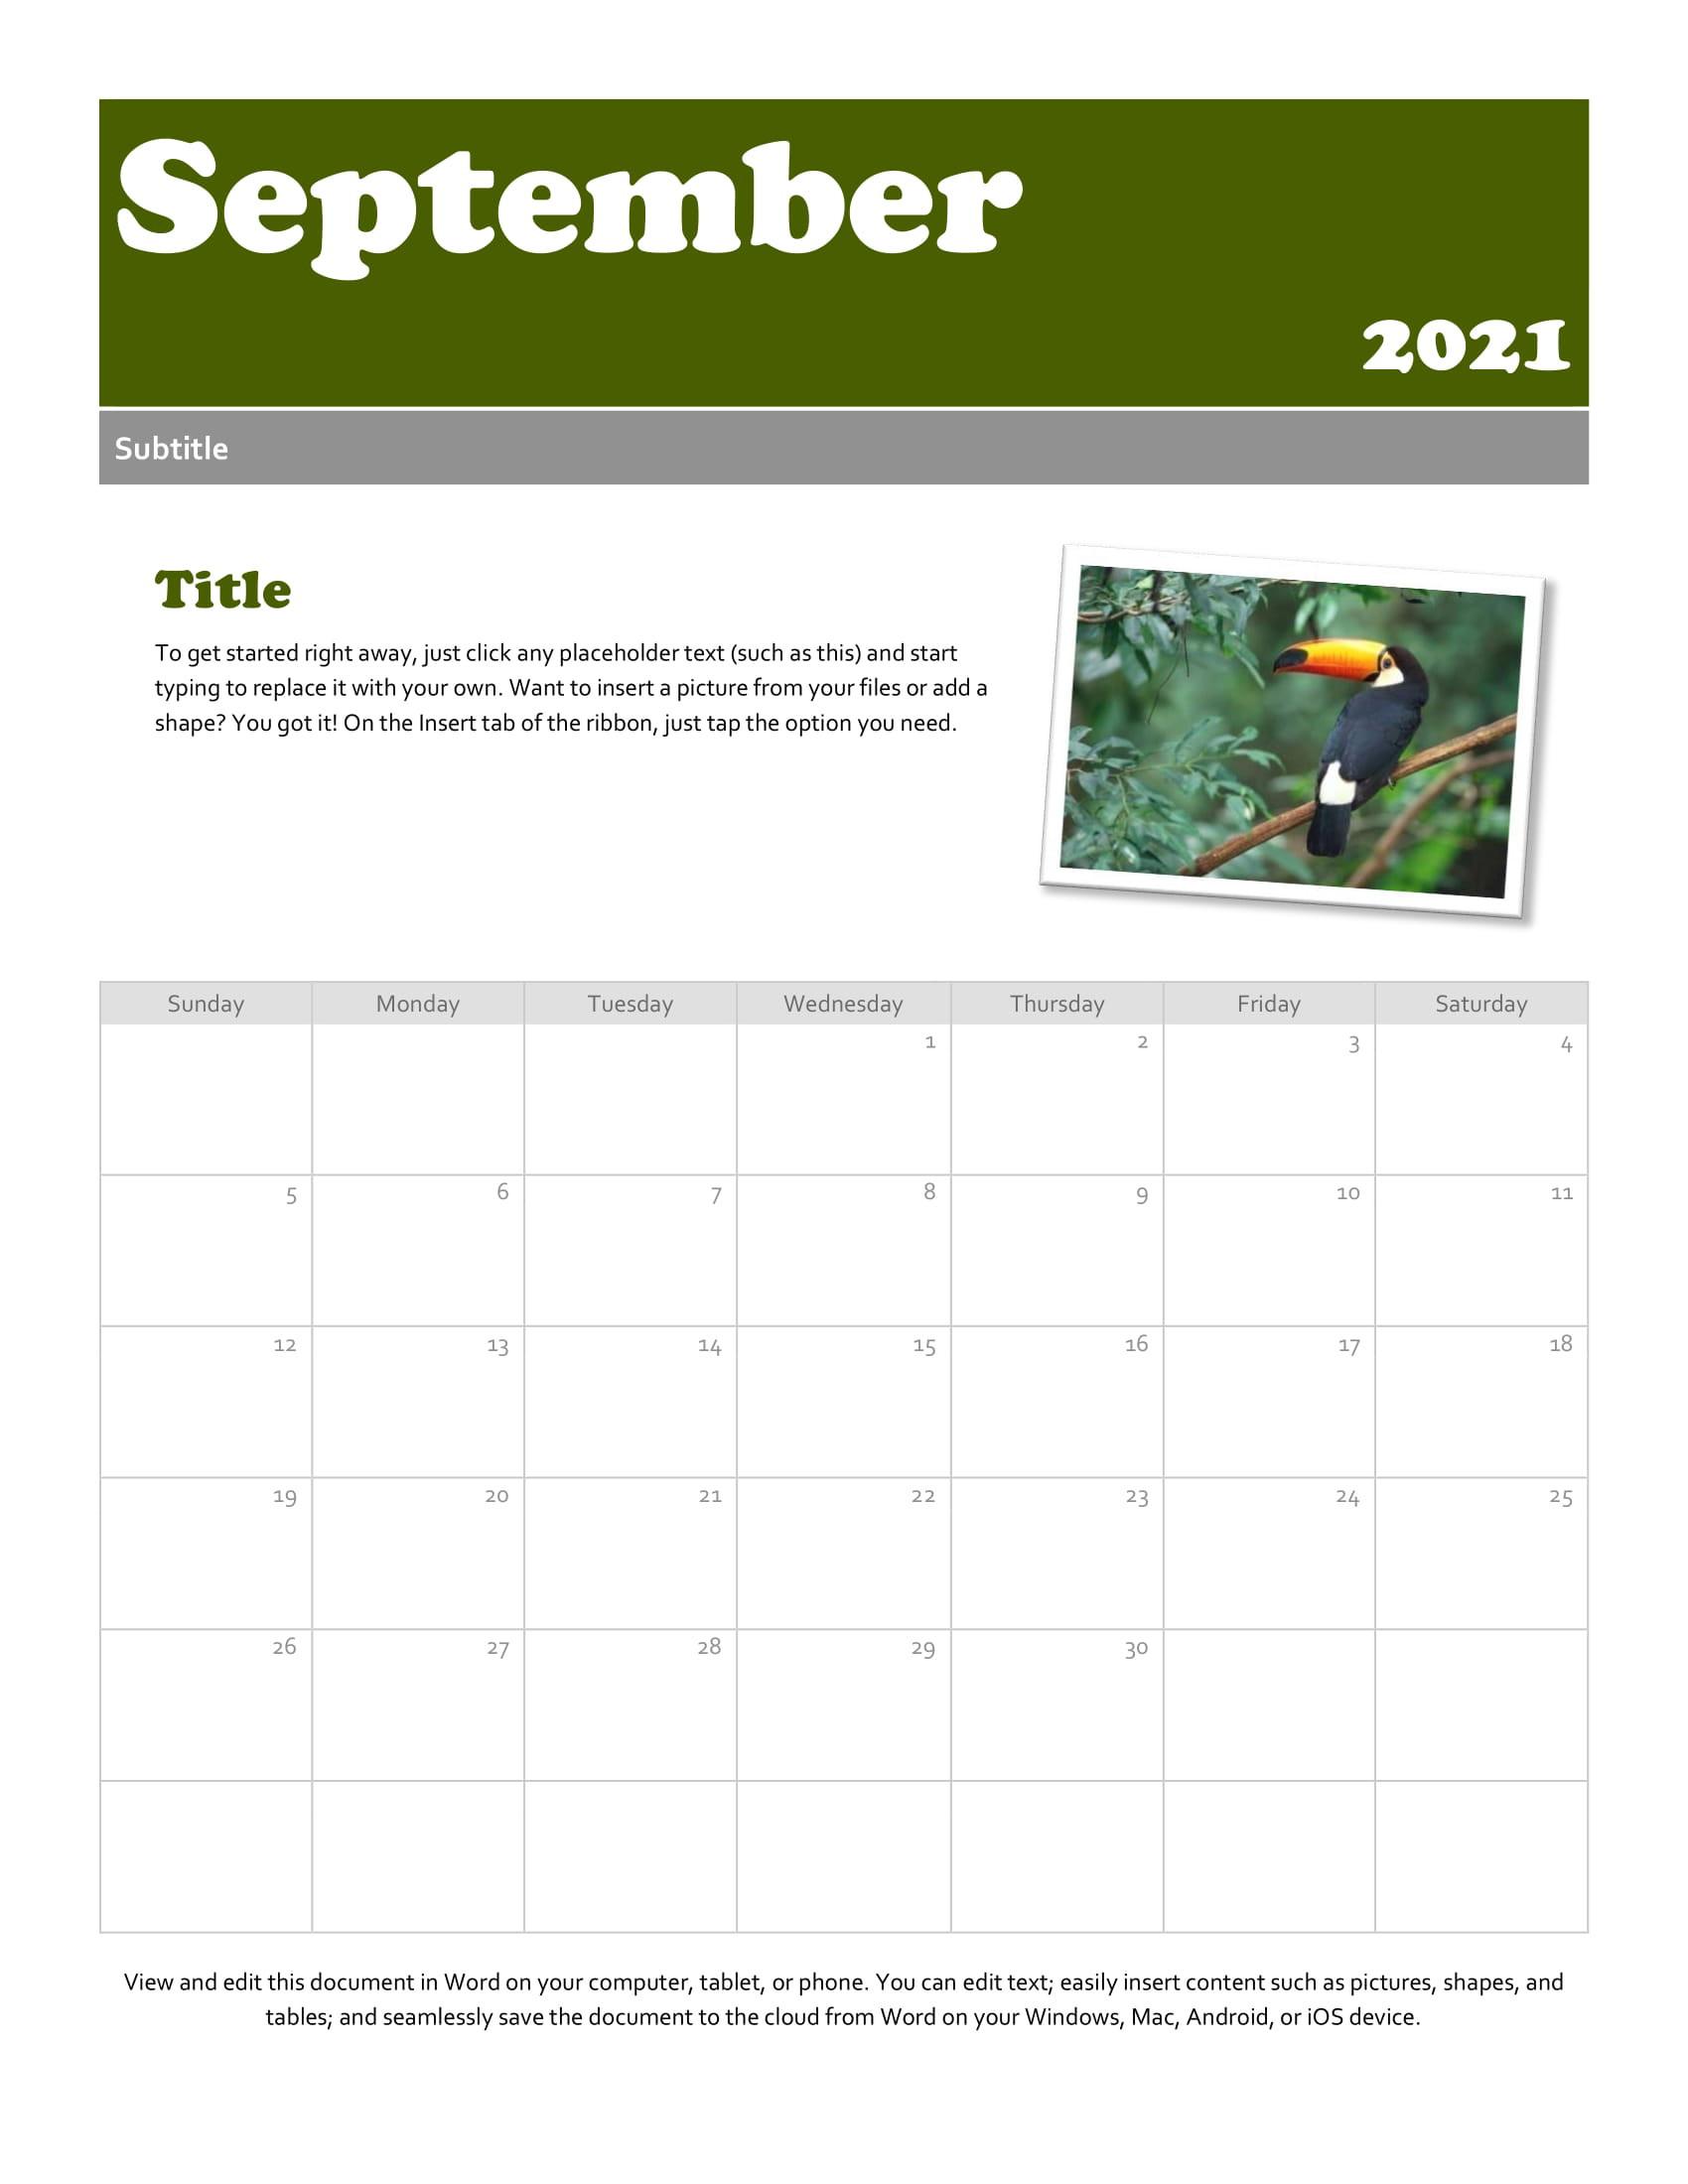 September 2021 Calendar | Calendar Printables Free Blank  Nc Deer Rut 2021